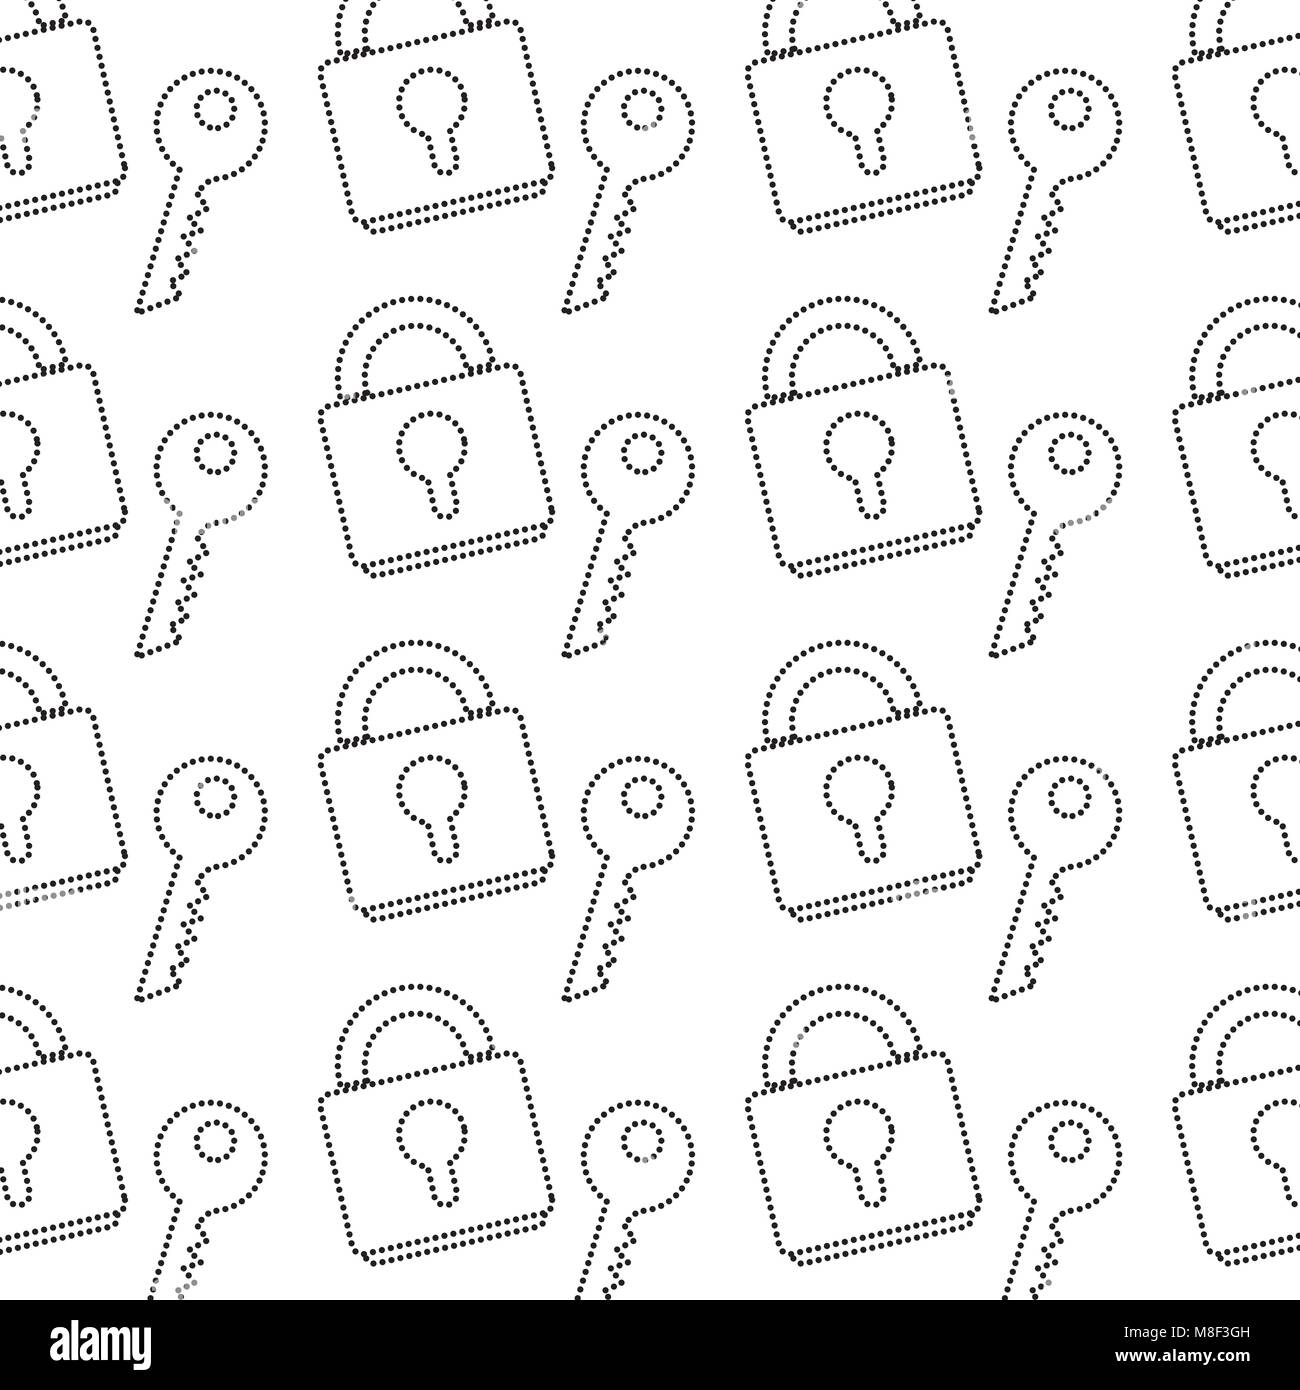 dotted shape close padlock object with key background - Stock Image